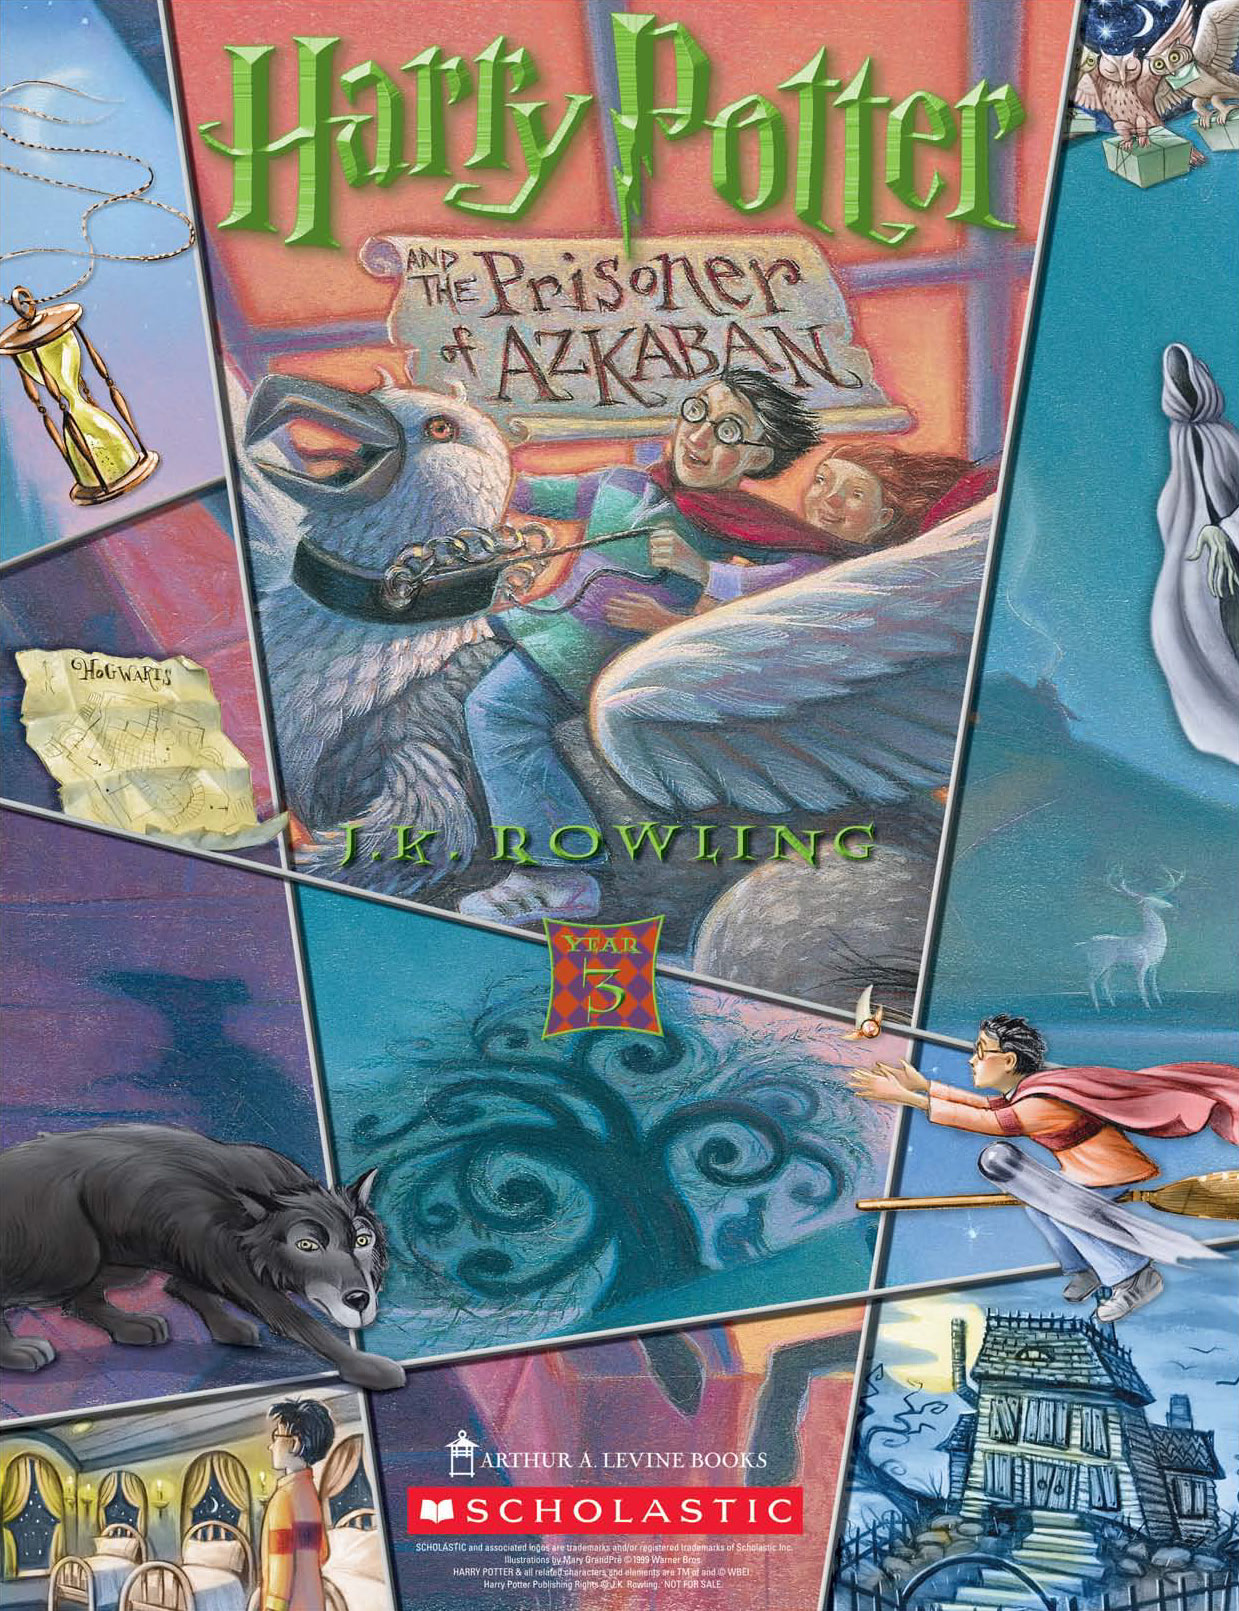 'Prisoner of Azkaban' (Year 3) Scholastic promotional poster